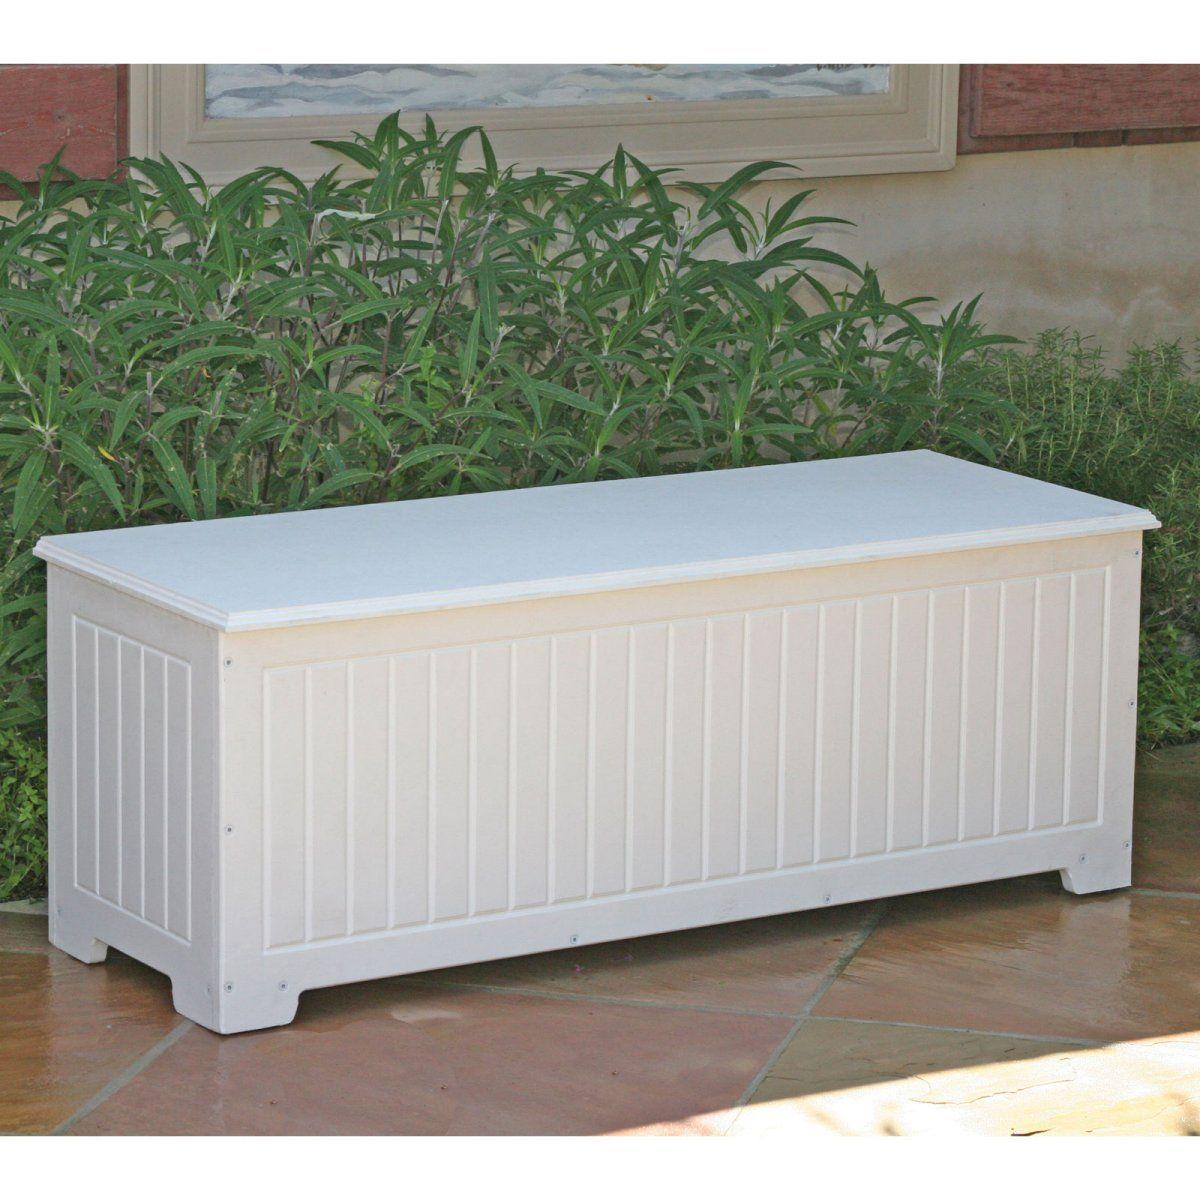 Sydney Flat Top Deck Box 299 00 Outdoor Storage Bench Outdoor